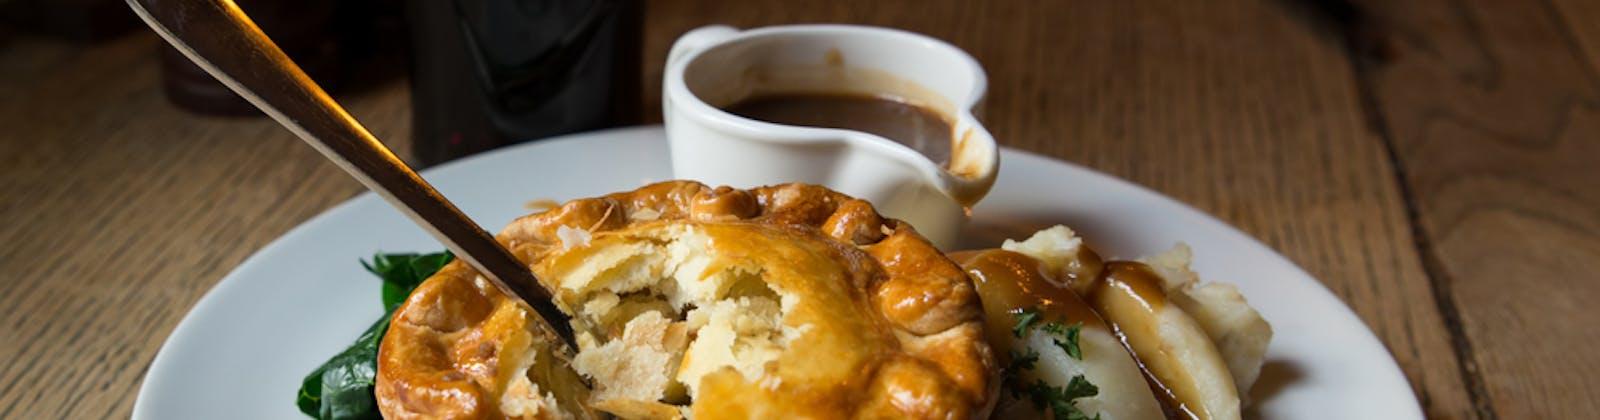 Pub pie with potato mash and greens